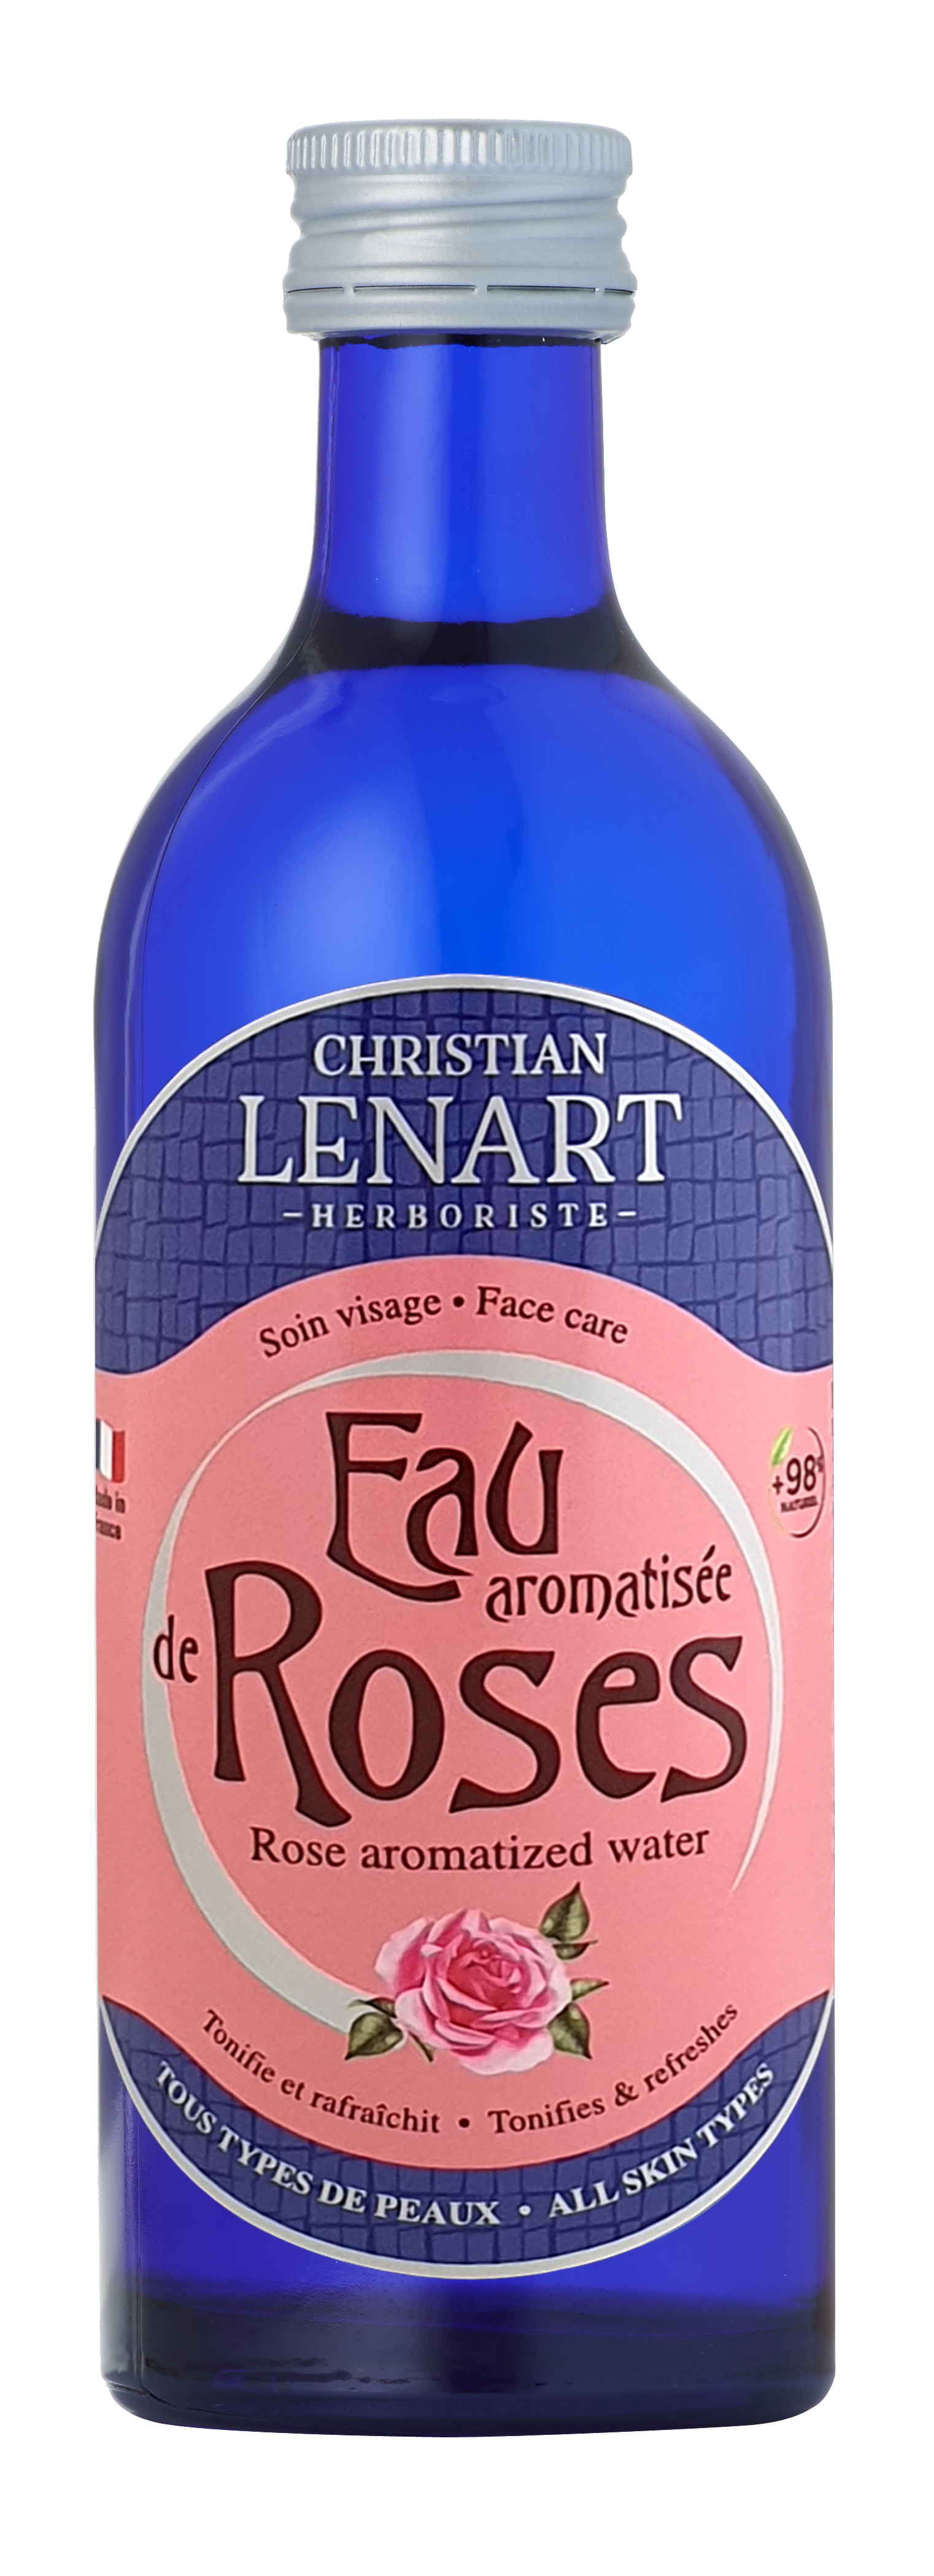 Bouteille Eau aromatisée de Rose Christian Lénart